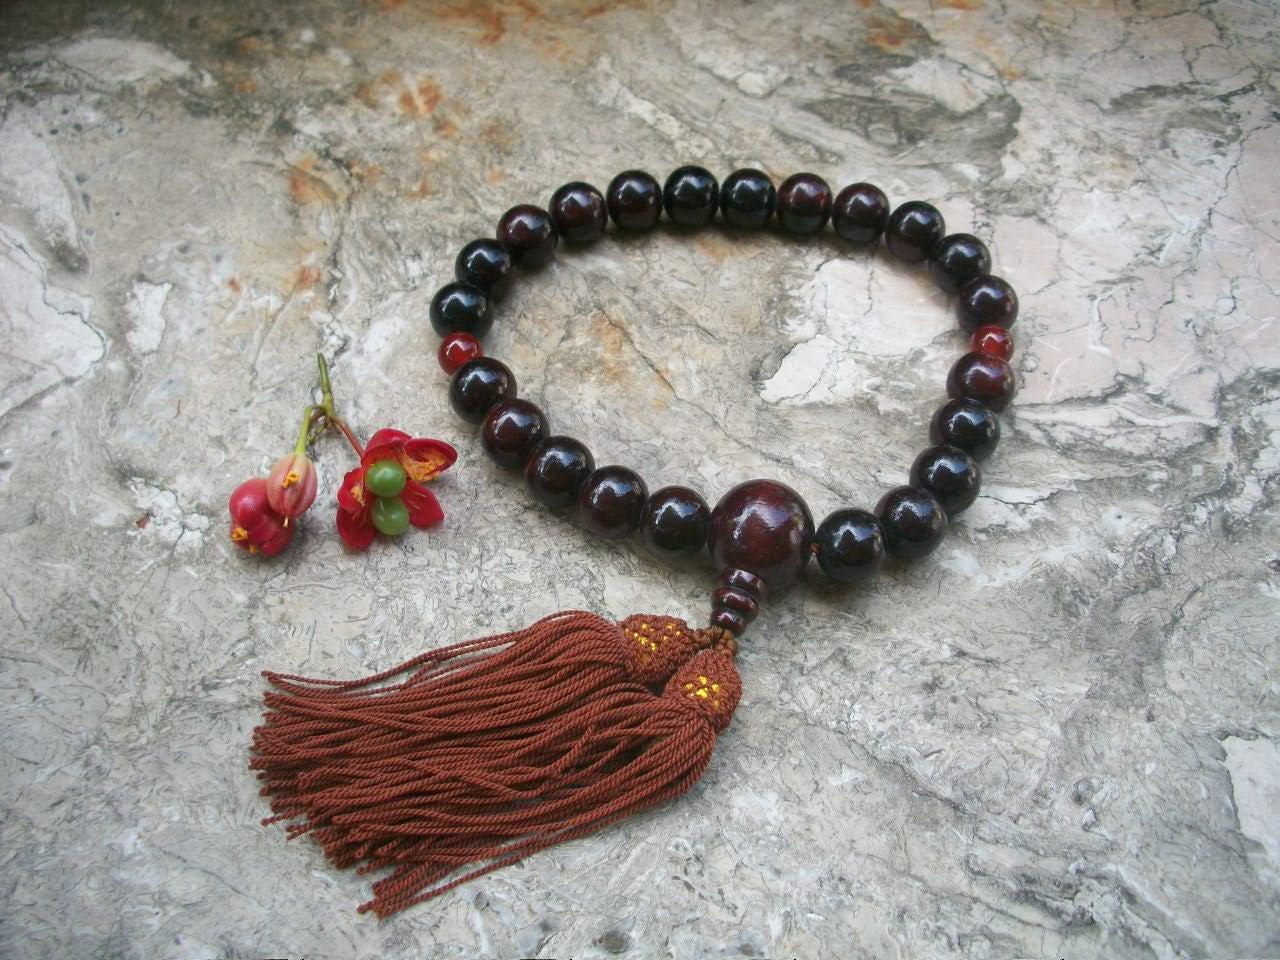 Japanese Juzu Buddhist Prayer Beads Mala Beads Buddhist Rosary